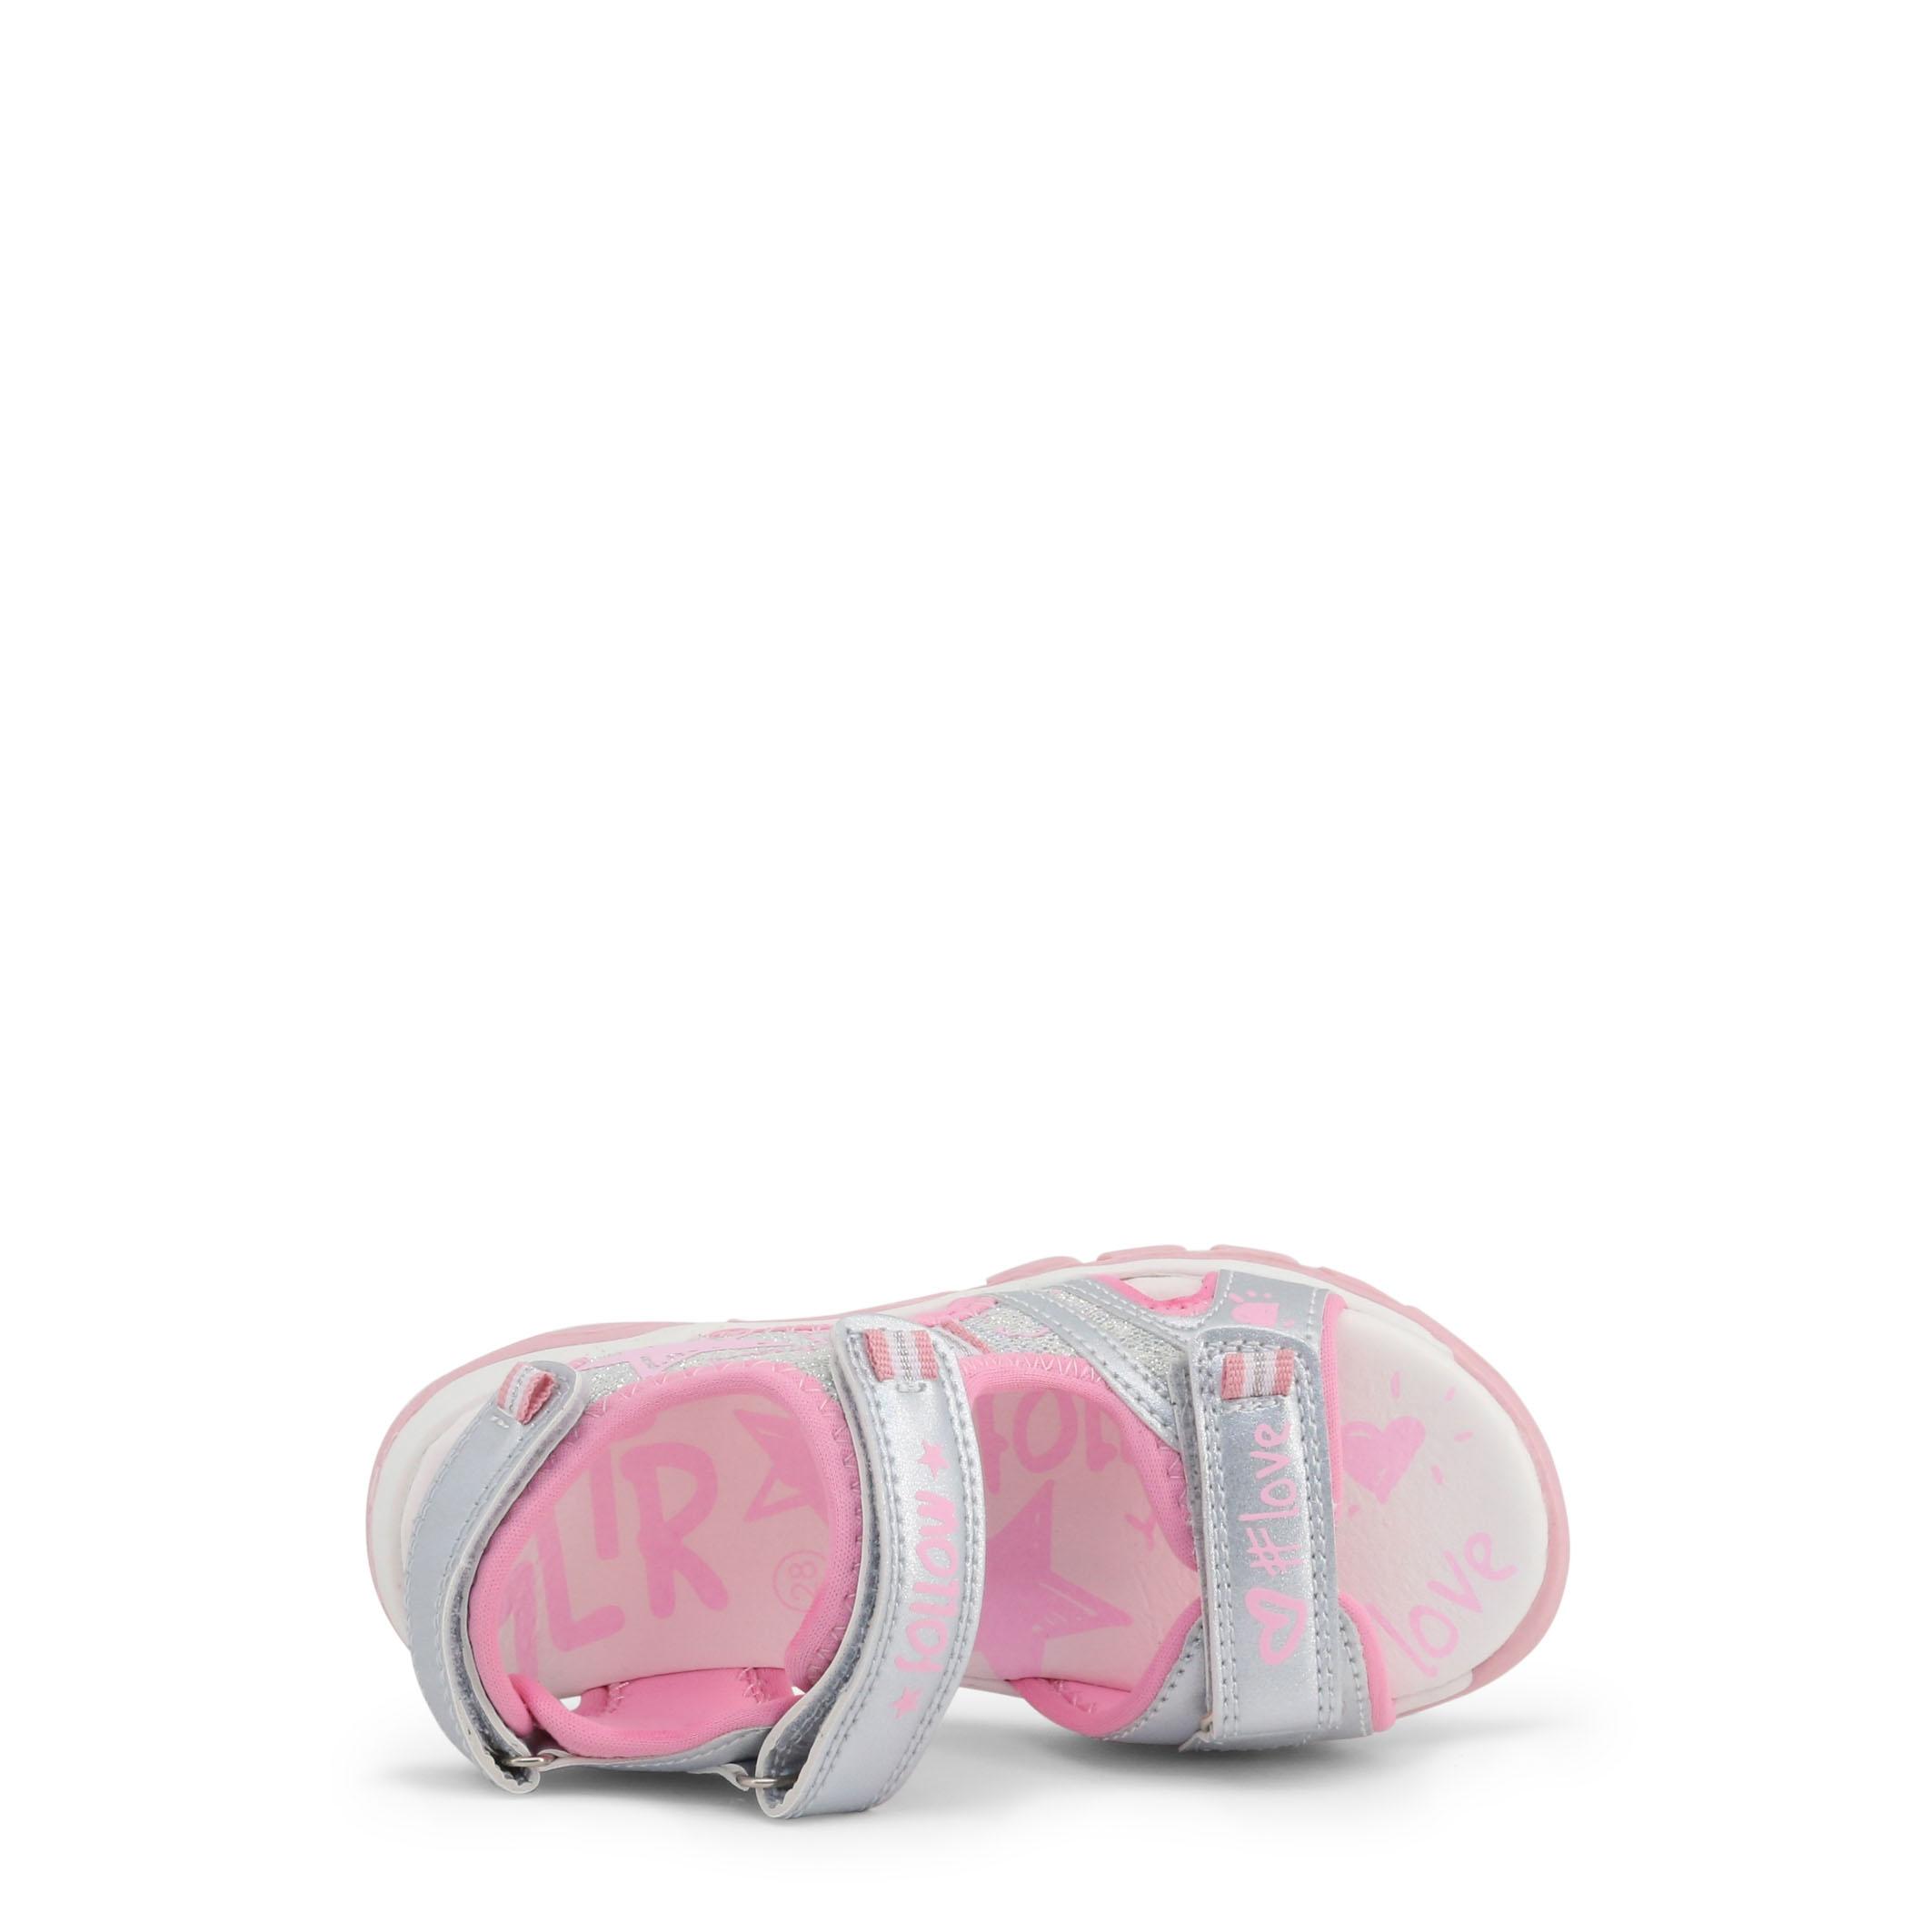 Sandale Shone 6015-025 Gri